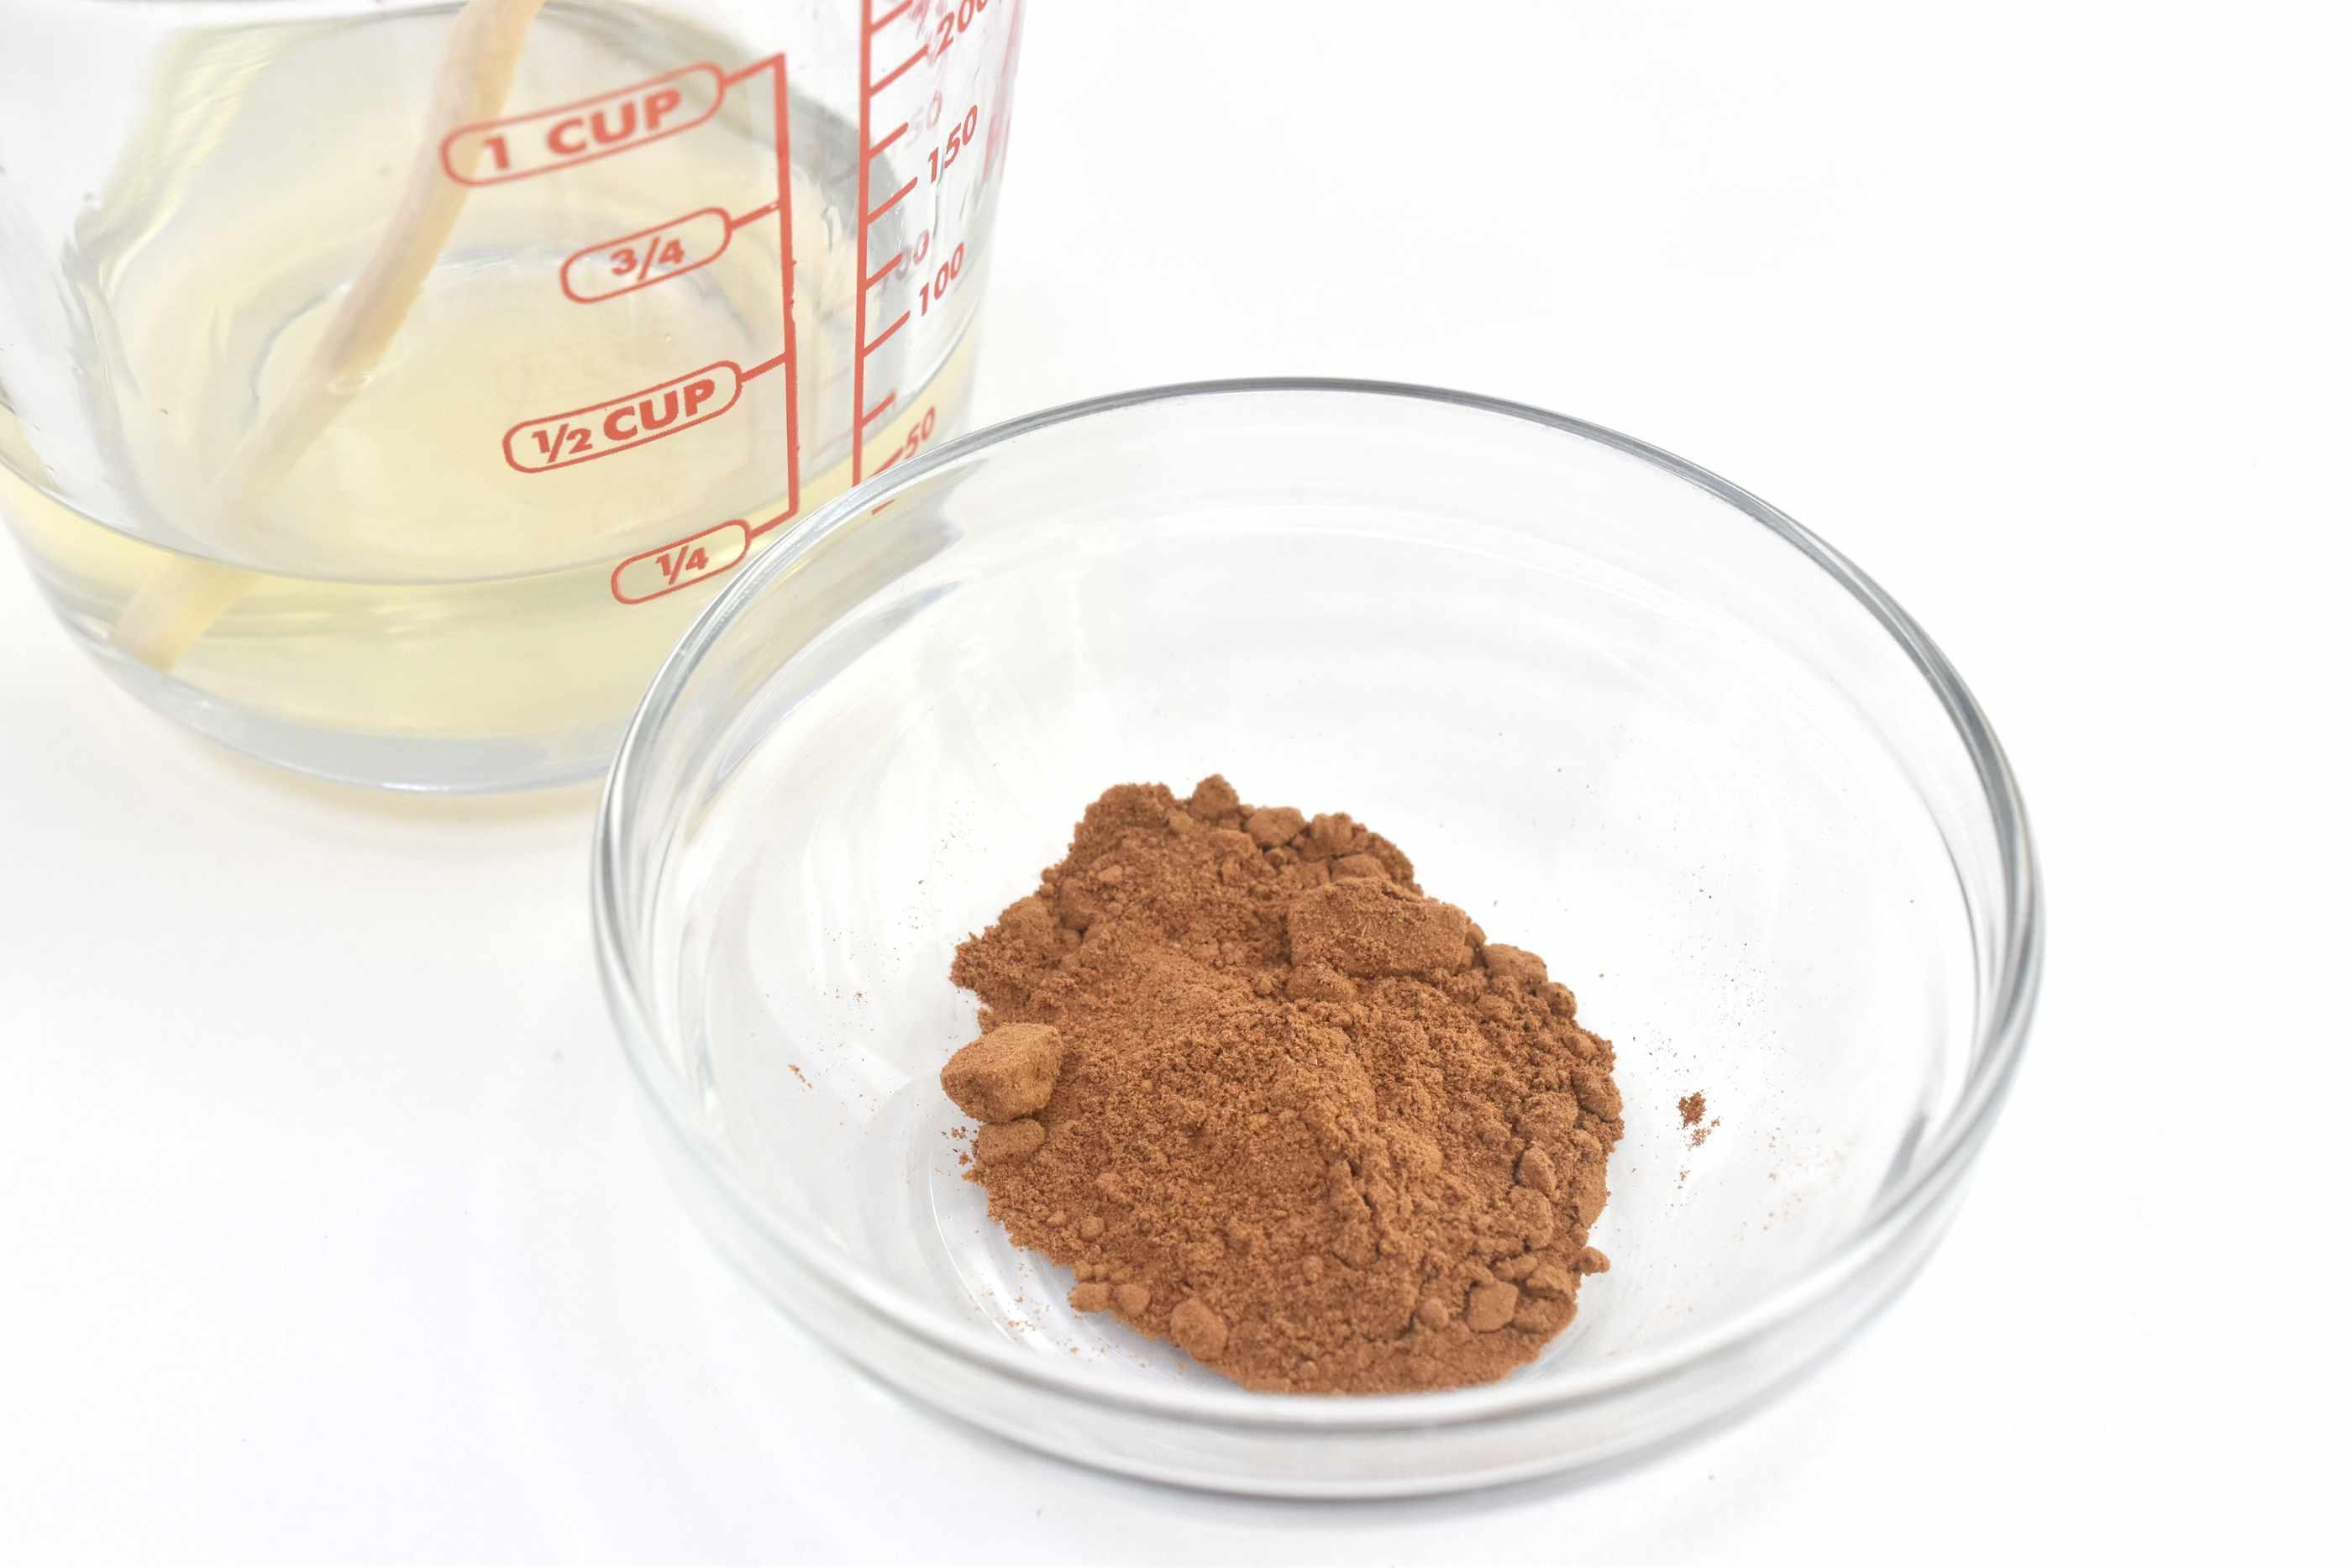 Use 1 to 2 Teaspoons of Pumpkin Pie Spice and Cinnamon Oil